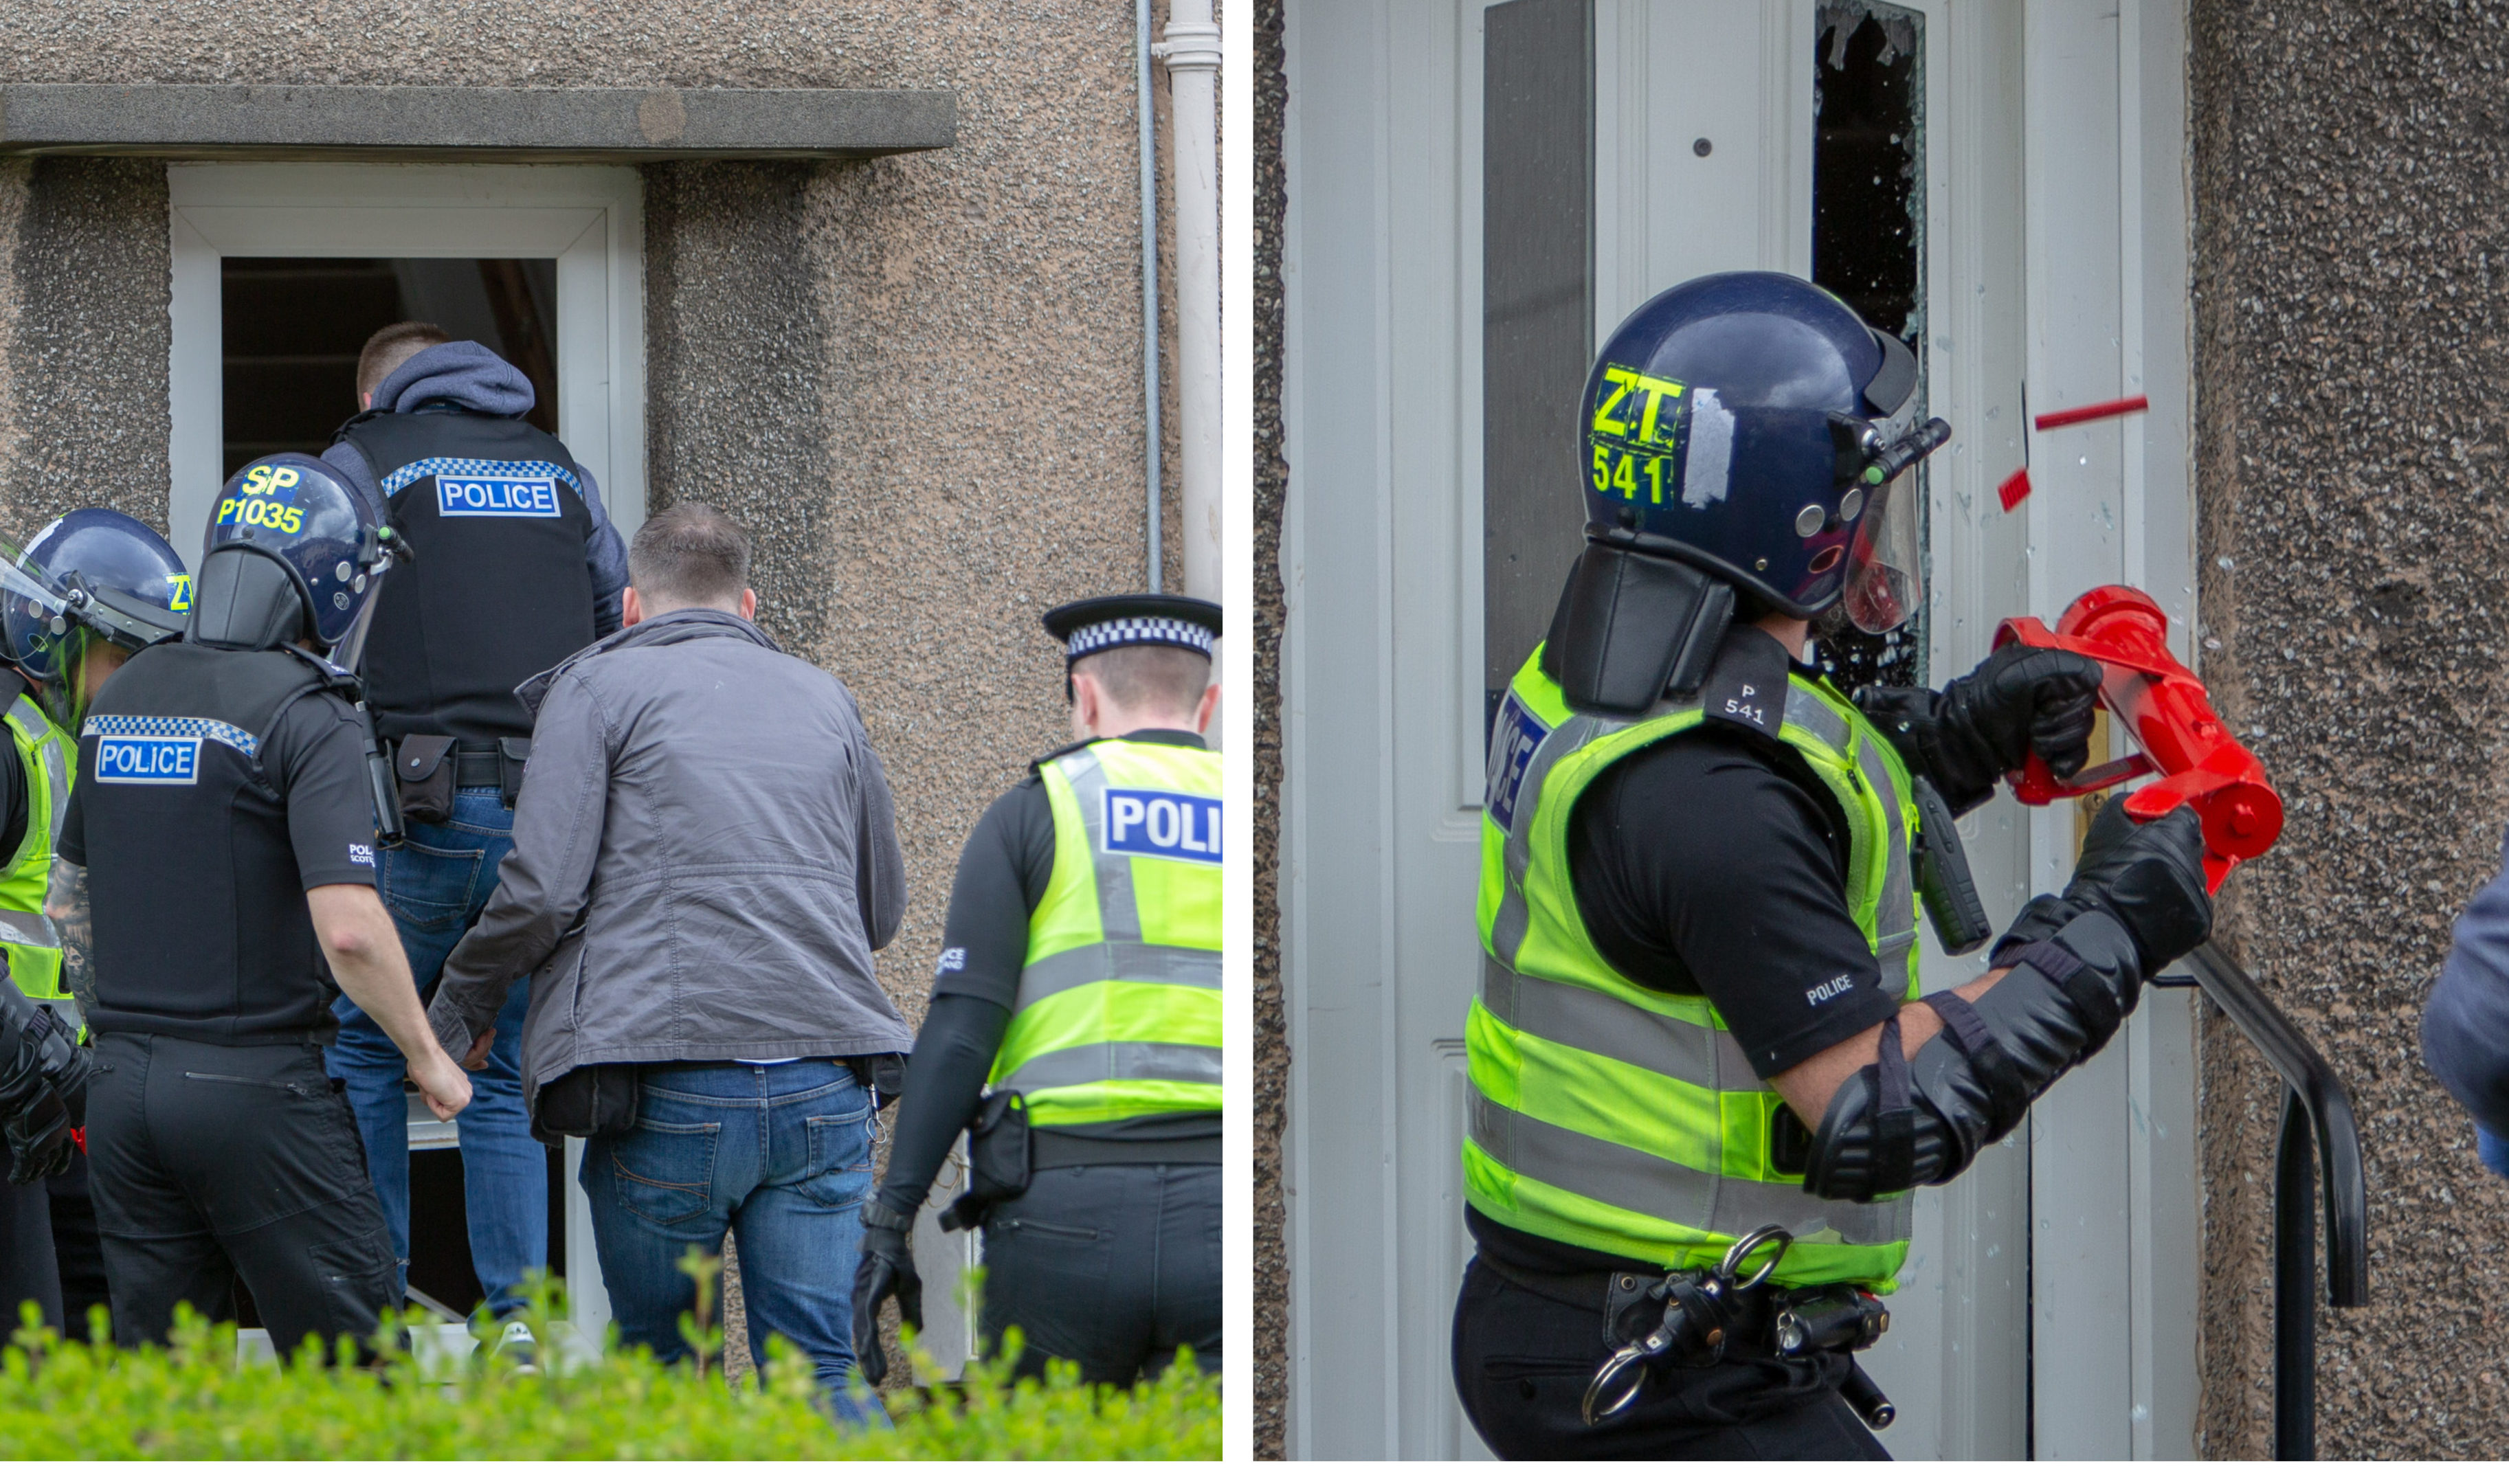 The raid in Kirkcaldy